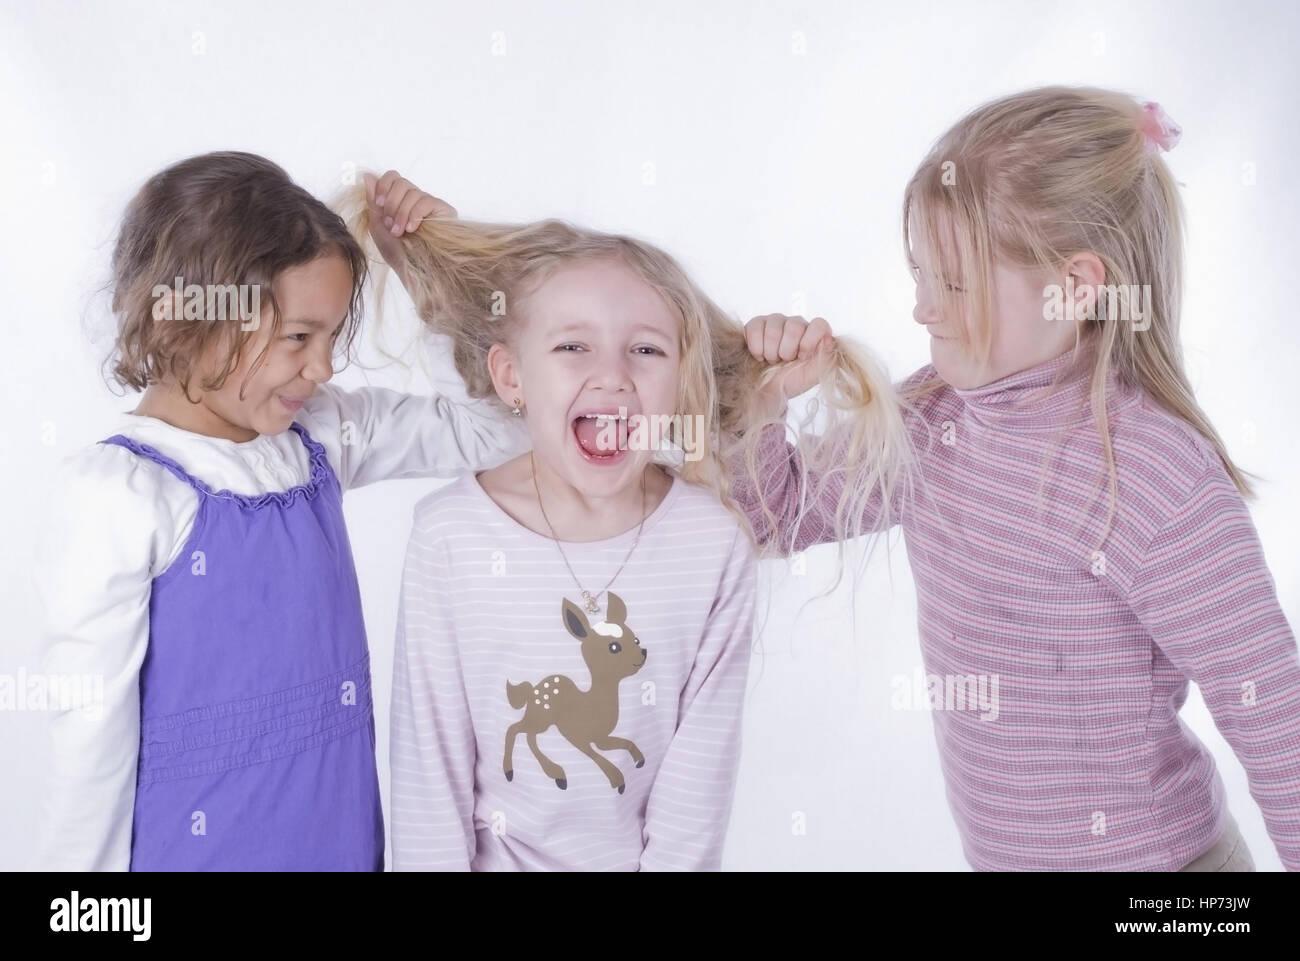 Model released, Zwei Maedchen reissen blondes Maedchen an den Haaren - girls in quarrel Stock Photo